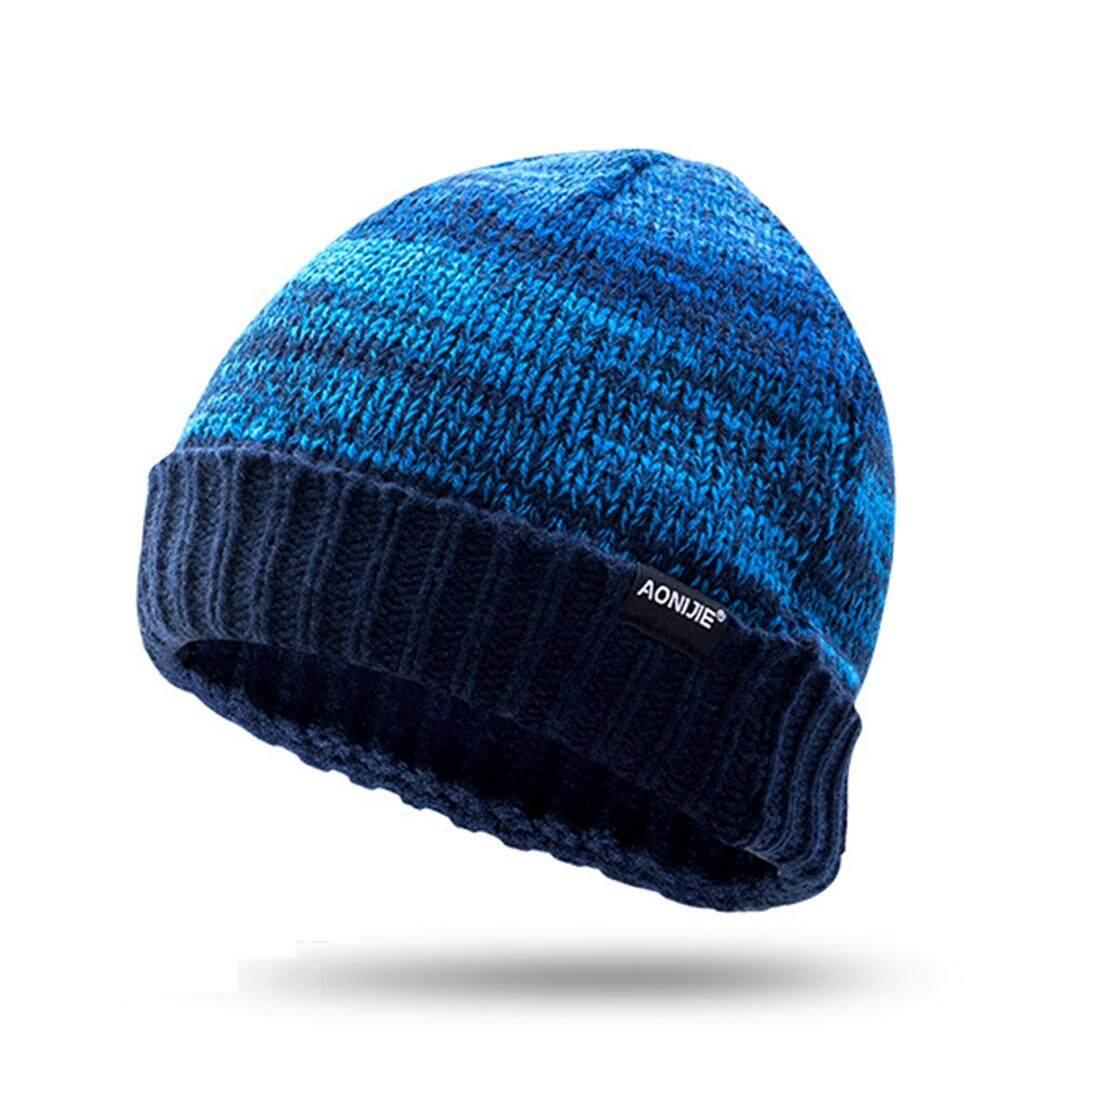 Buy Sell Cheapest Zloyi Aonijie Topi Best Quality Product Deals Knitted Hat Acrylic 58 62 Cm Gray Biru Modis Uniseks Luar Ruangan Sport Musim Dingin Hangat Rajutan Internasional